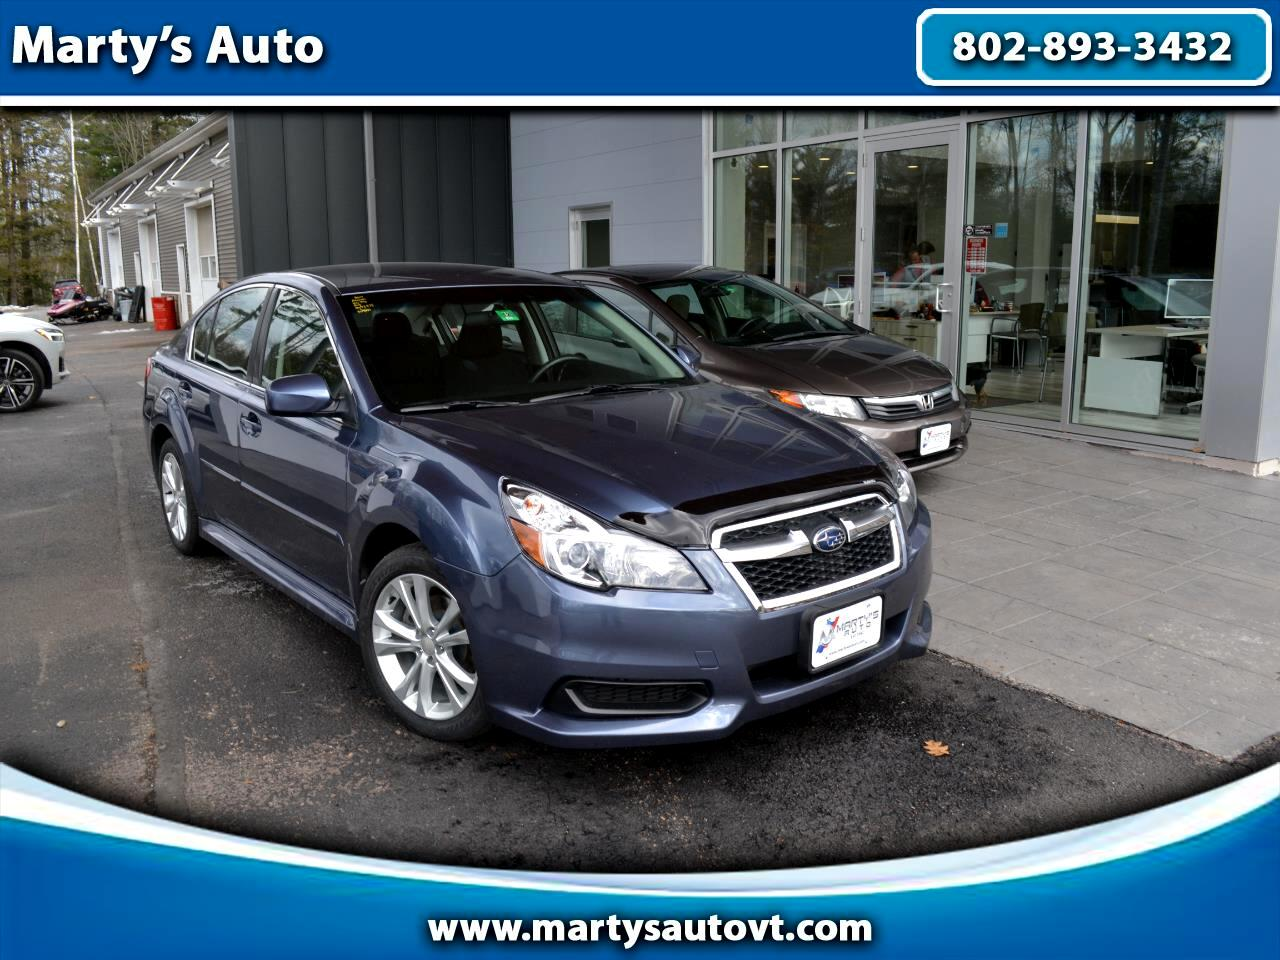 2014 Subaru Legacy 4dr Sdn H4 Auto 2.5i Premium